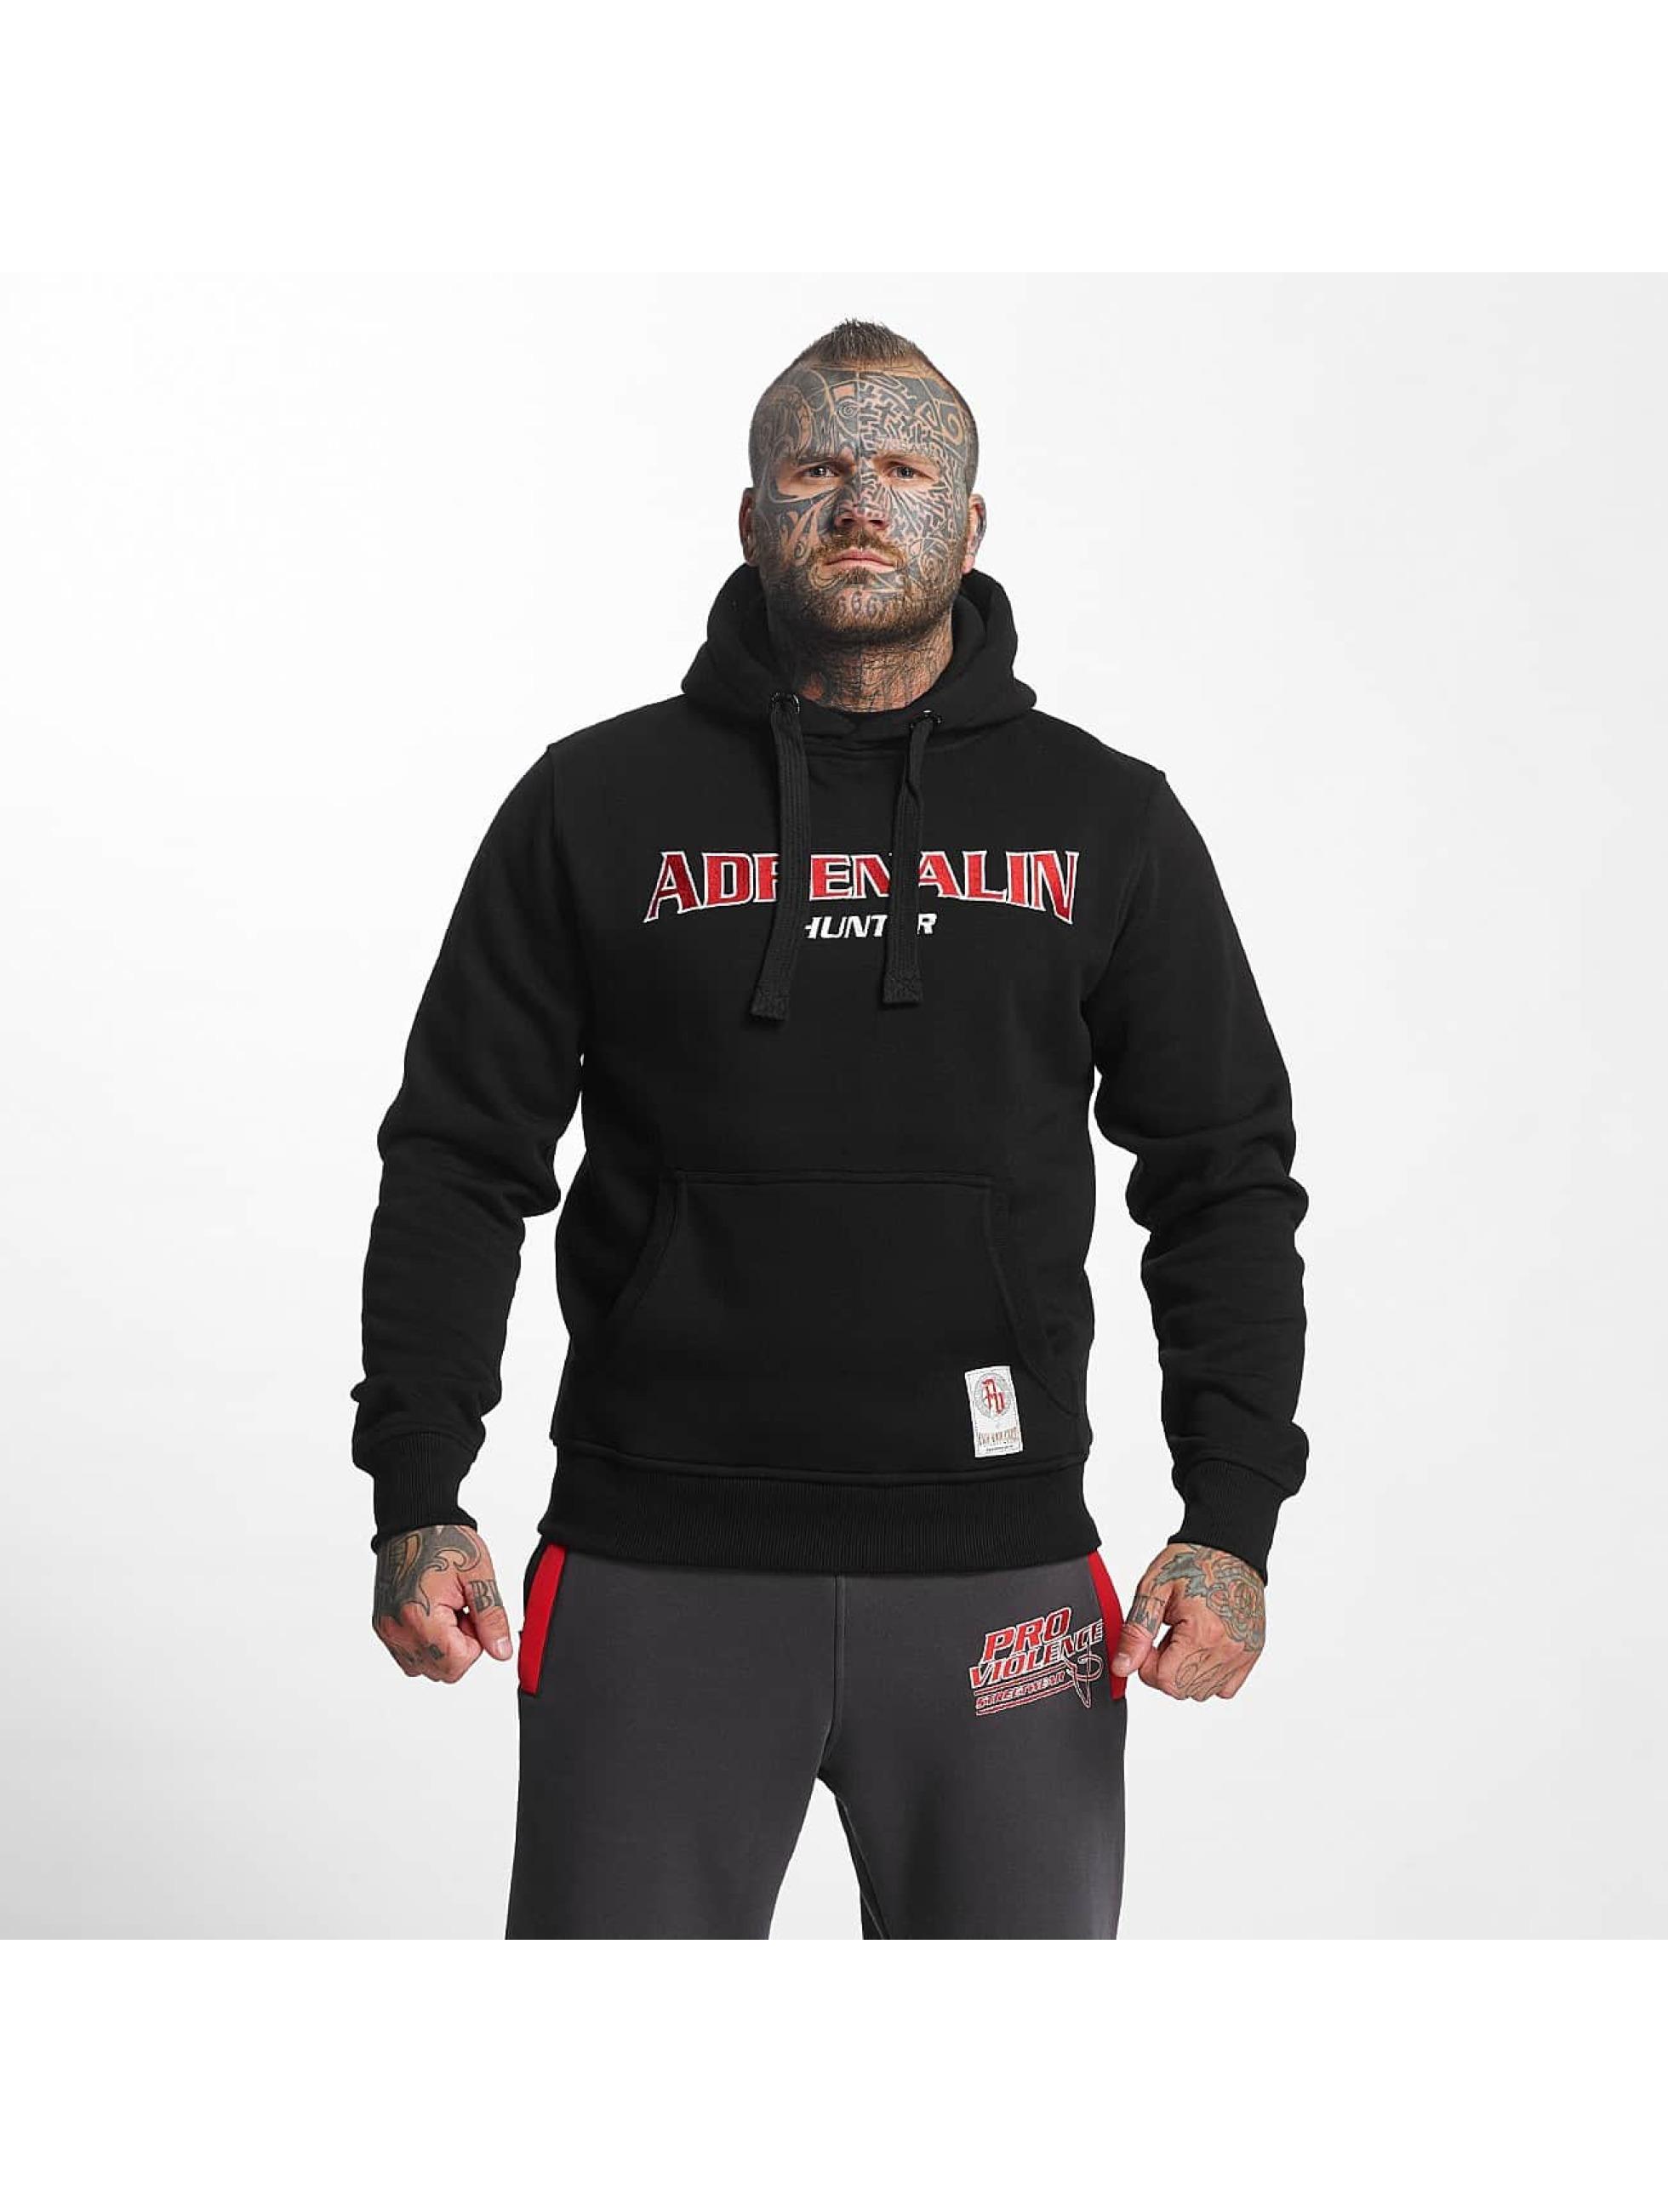 Pro Violence Streetwear Hoodie Adrenlin Hunter black